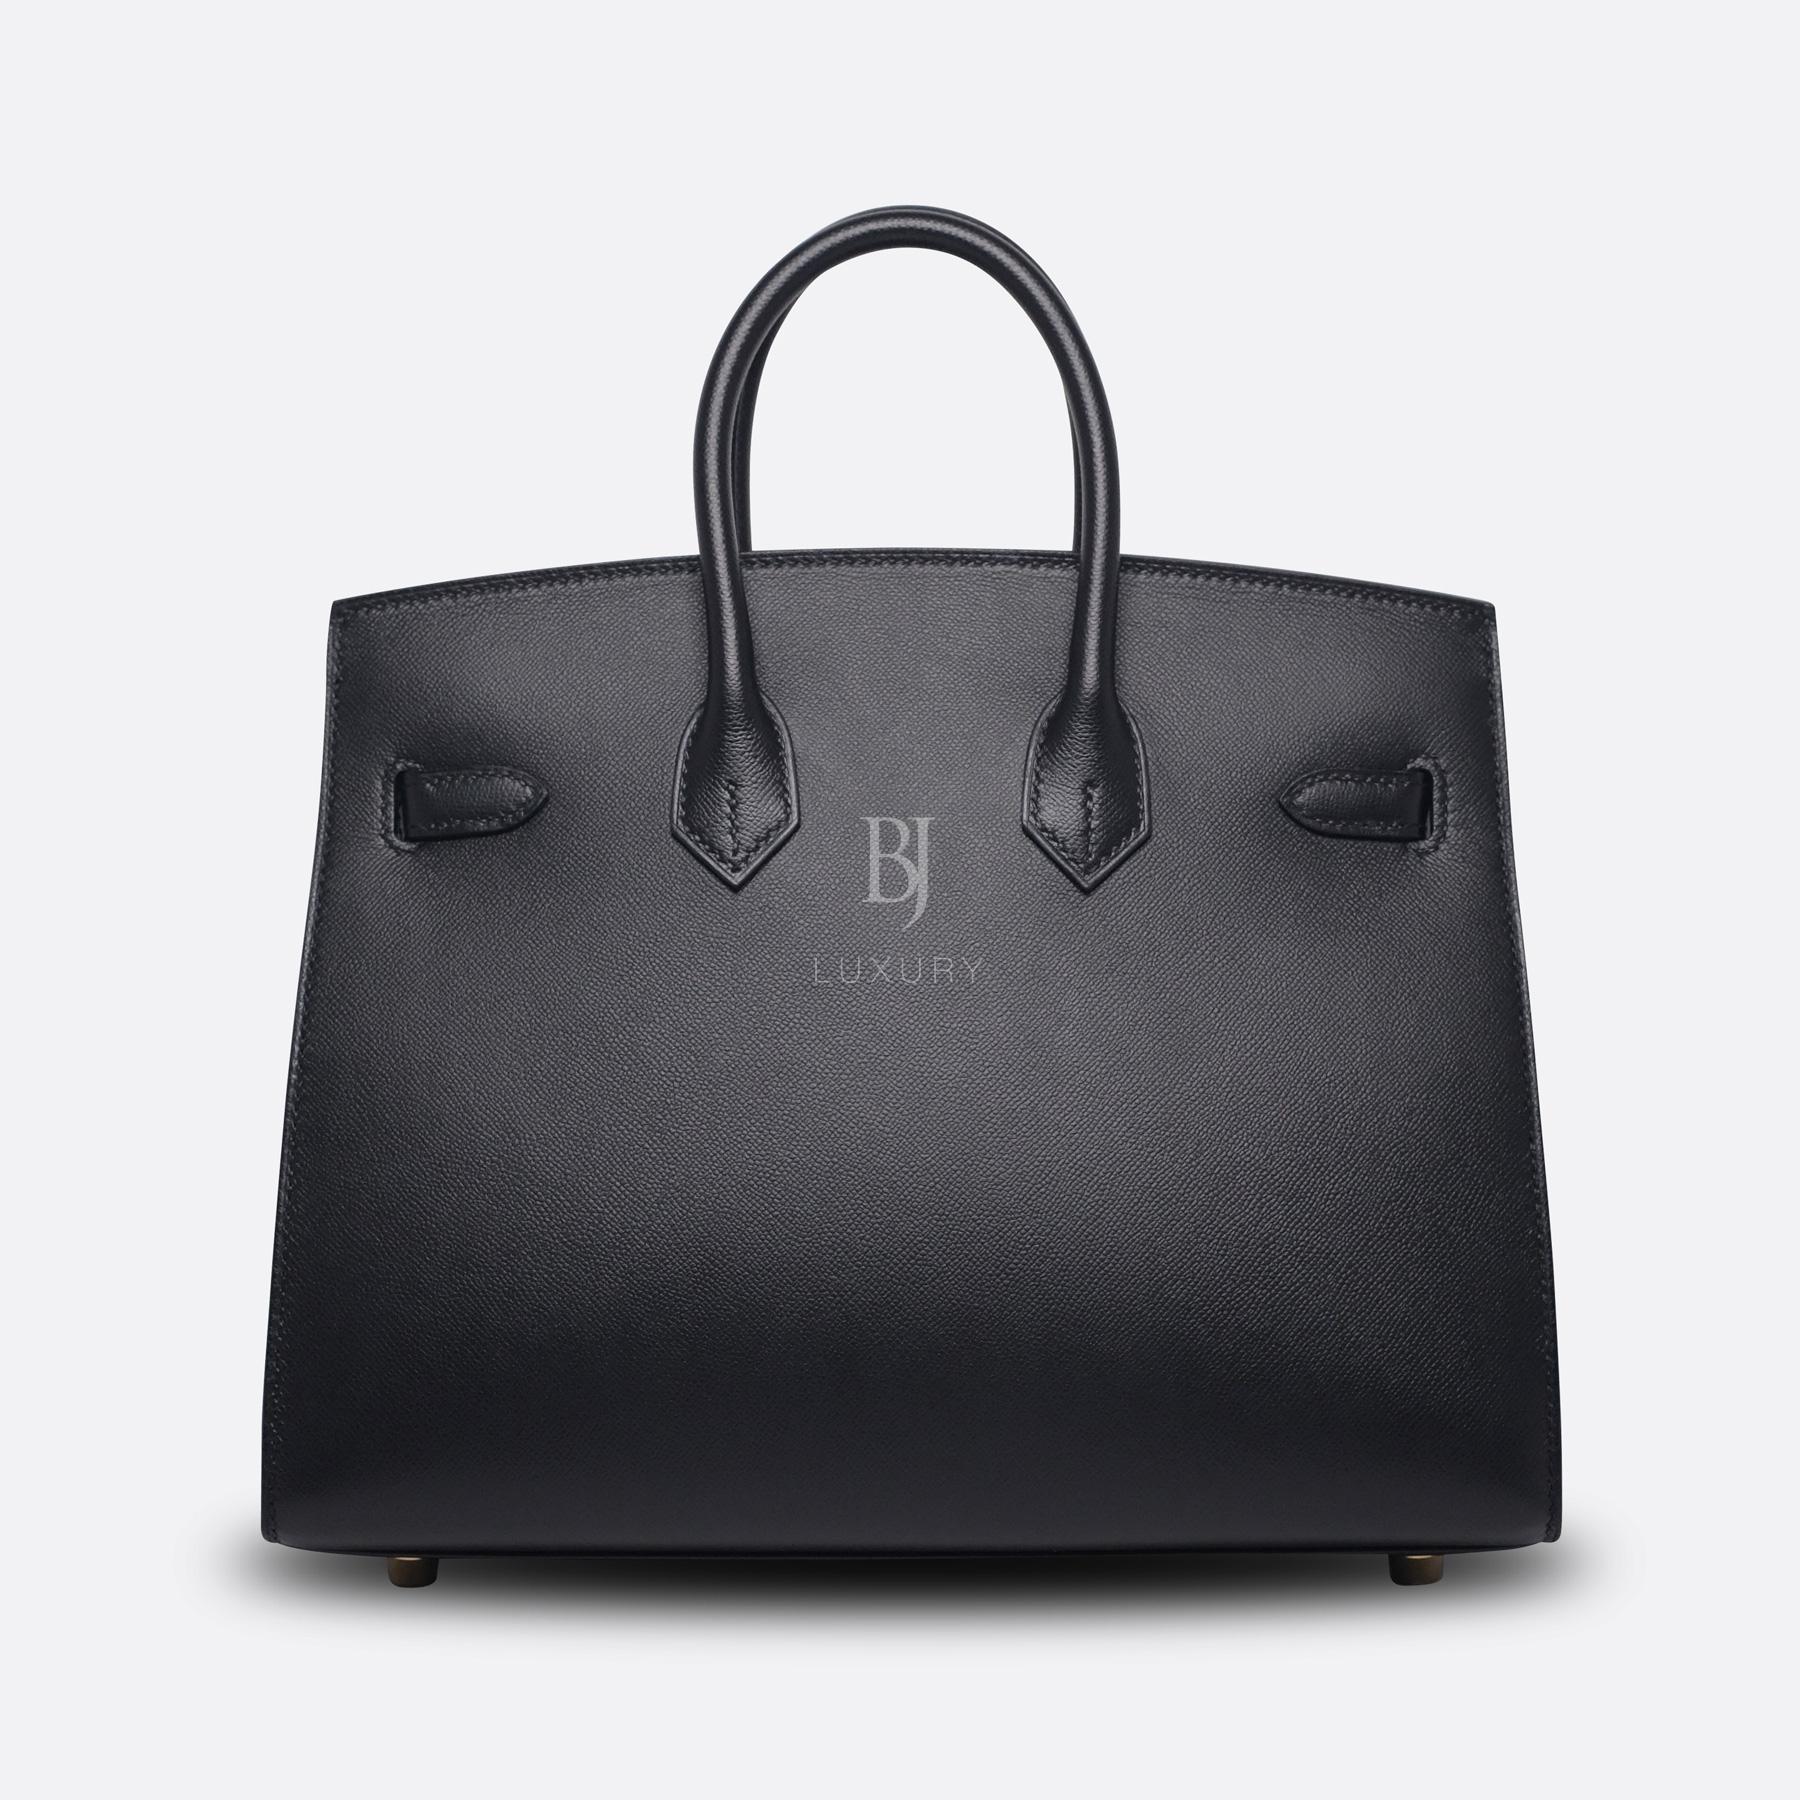 Birkin Sellier 25 Black Veau Madame Gold BJ Luxury 12.jpg